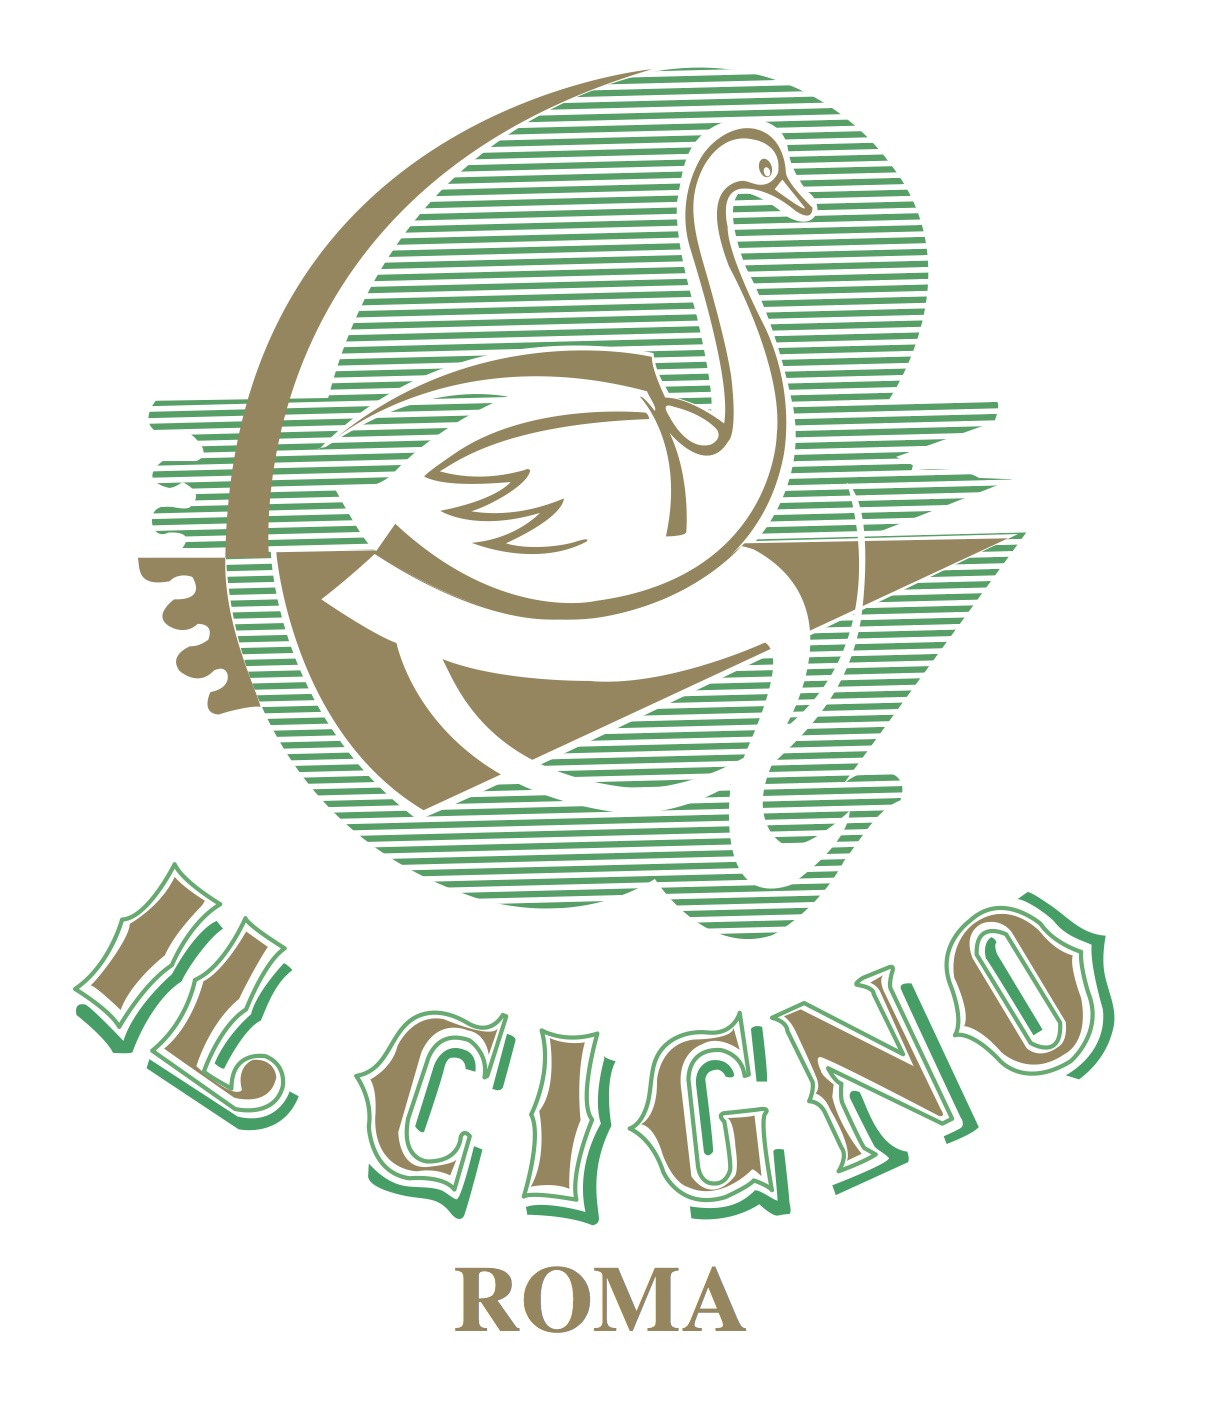 LOGO CIGNO (1)